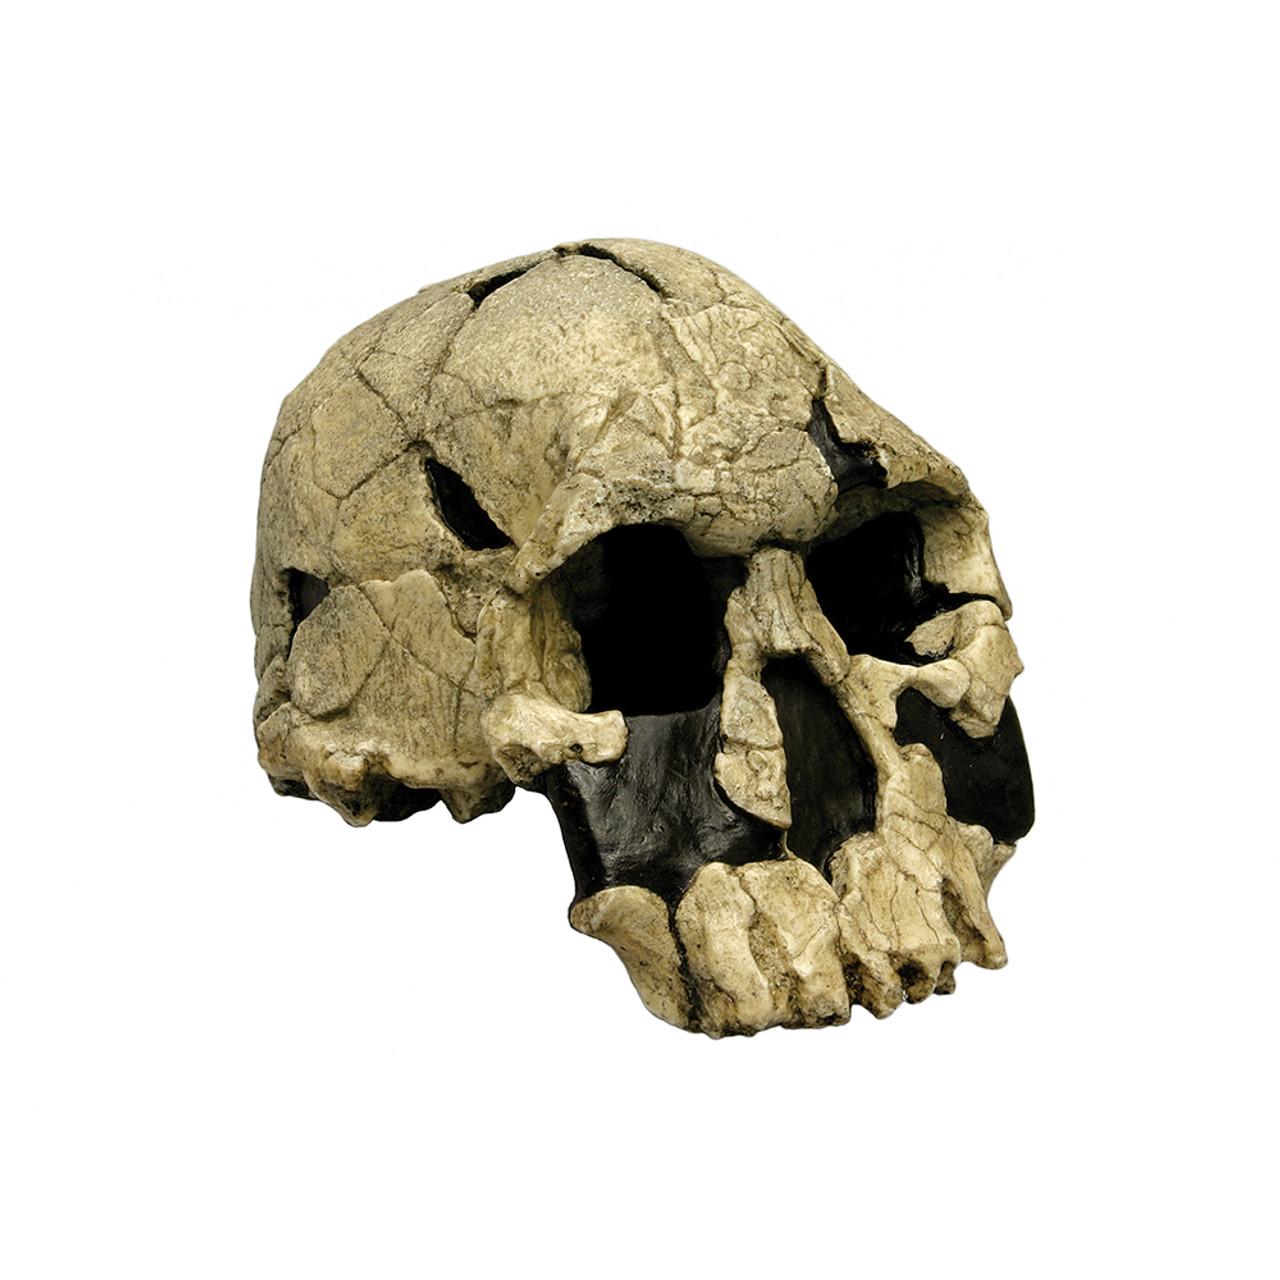 Homo rudolphensis, KNM-ER 147